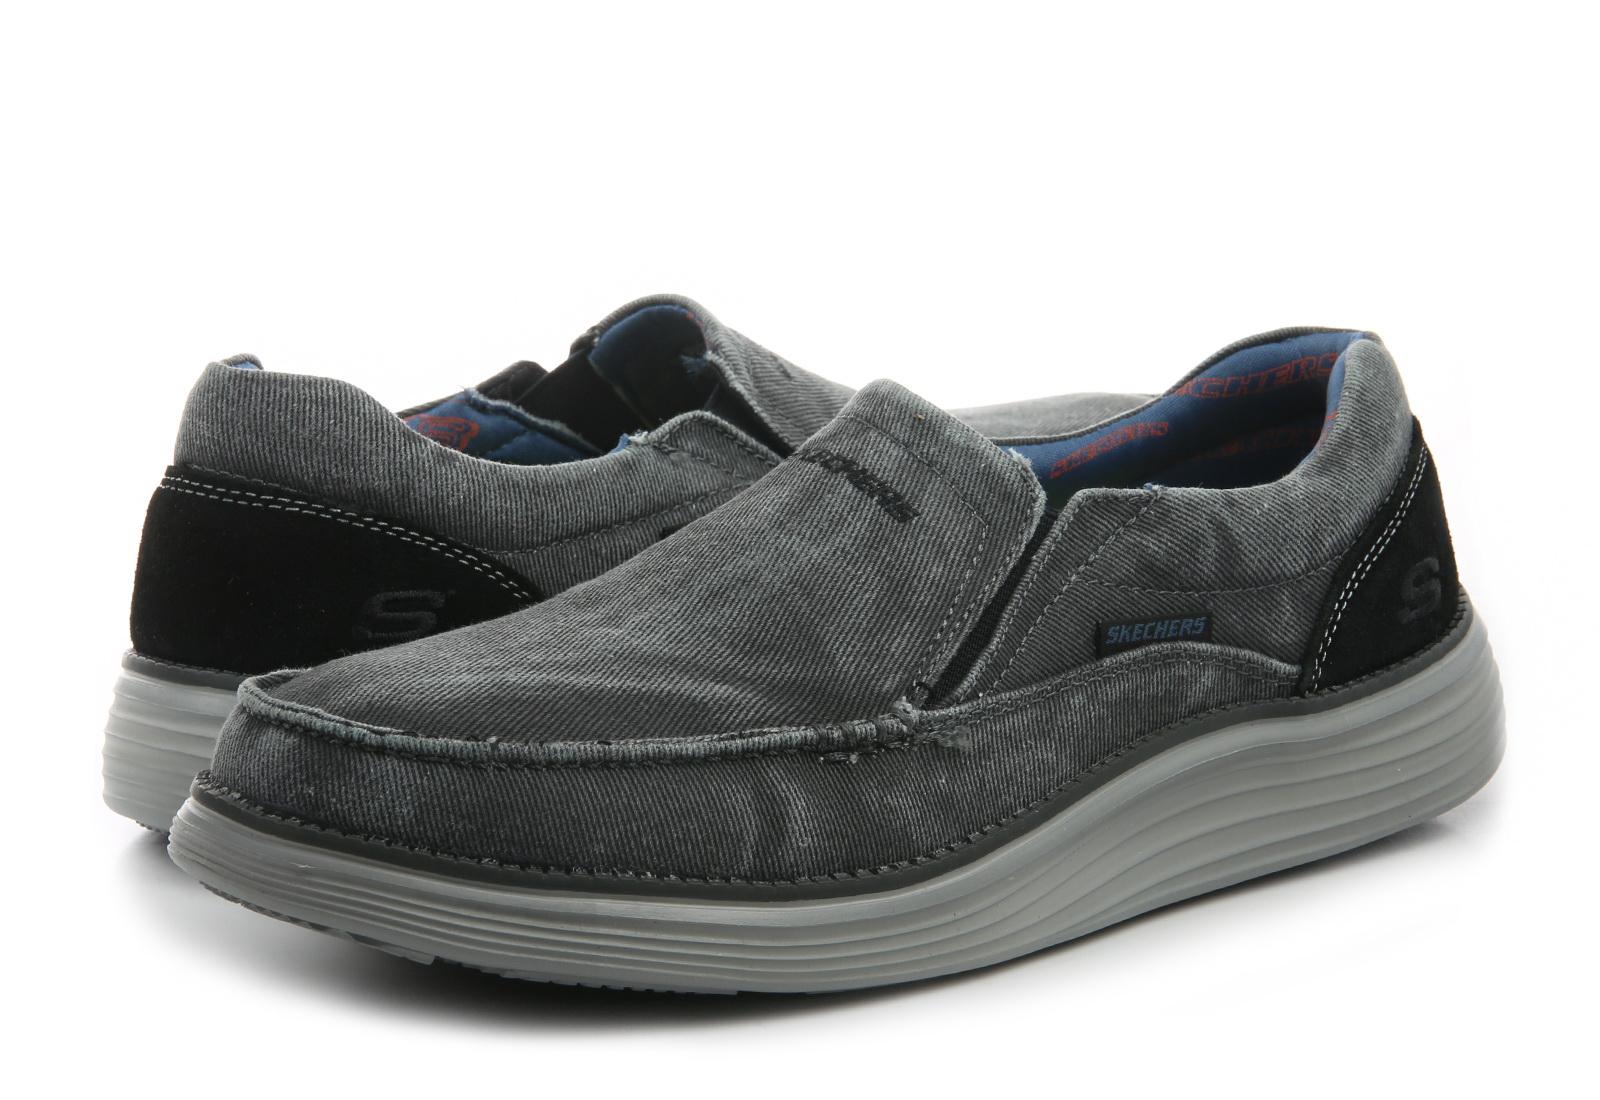 Skechers Slip-on Cipele Crne Cipele - Status 2.0 - Mosent - Office Shoes -  Online trgovina obuće 6c112644234